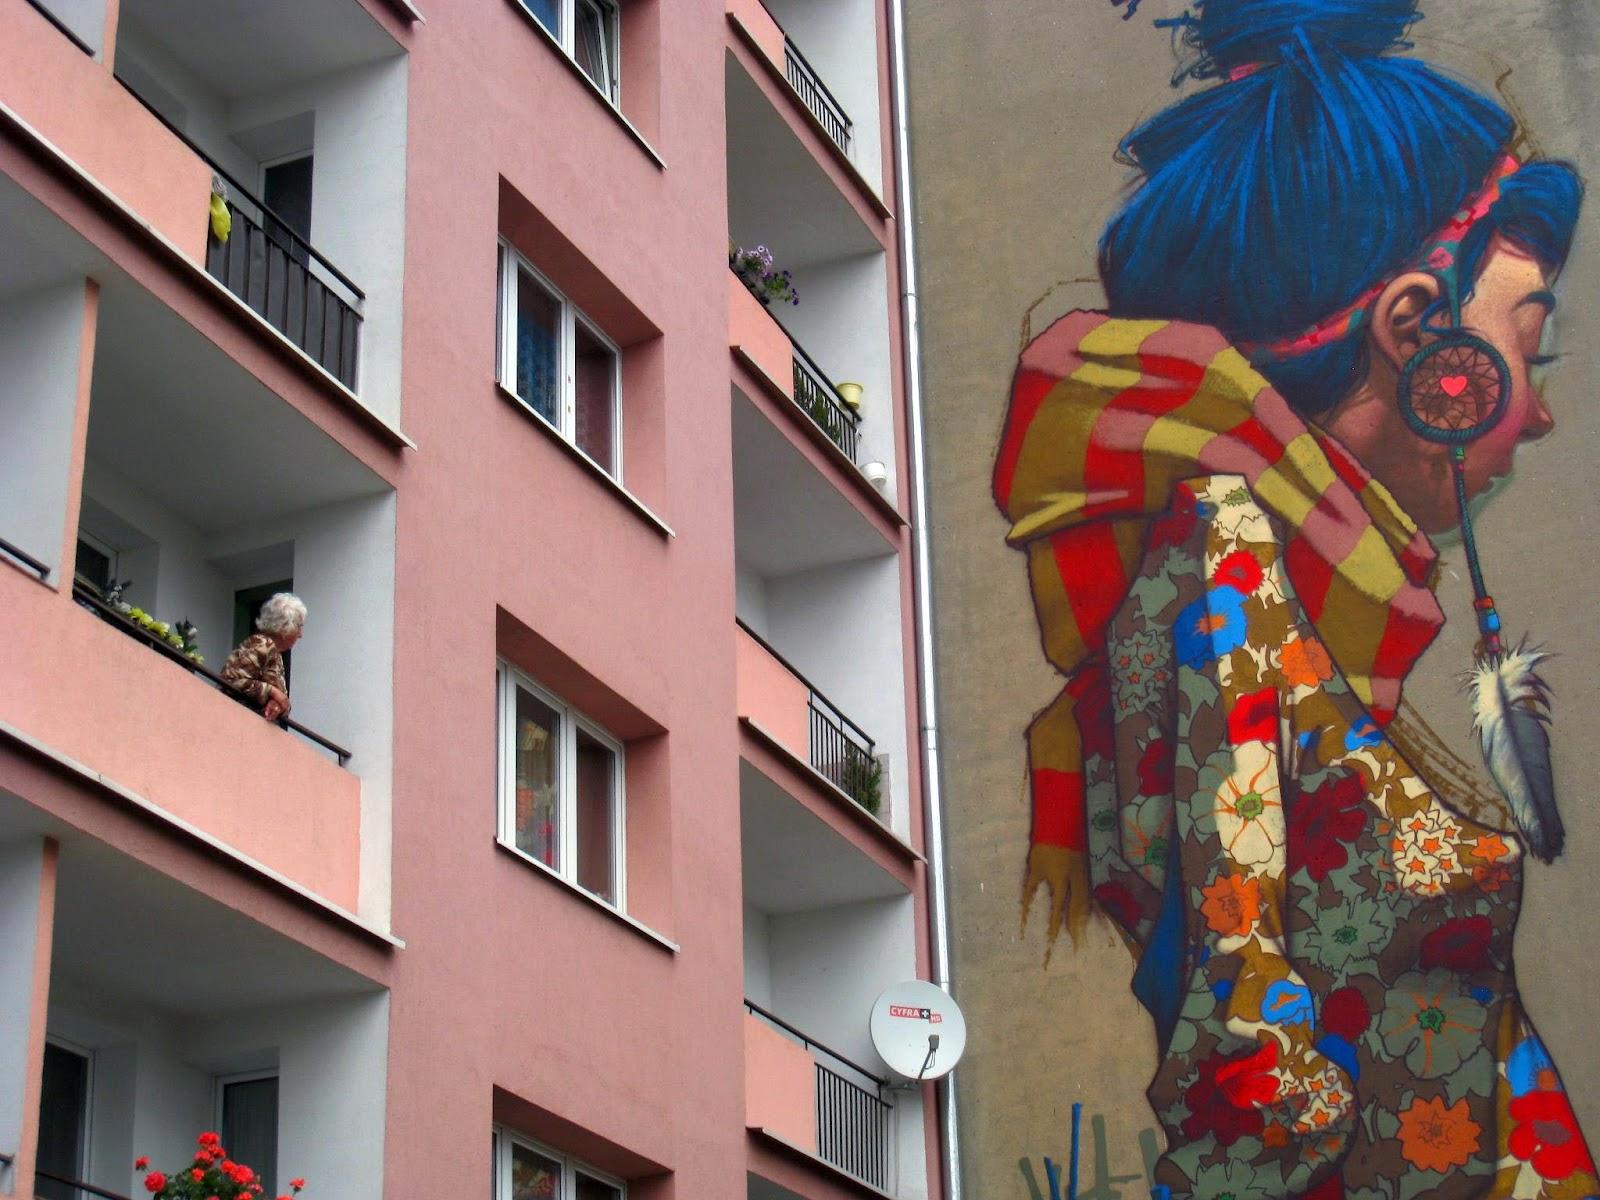 Sainer New Mural In Lodz Poland Streetartnews